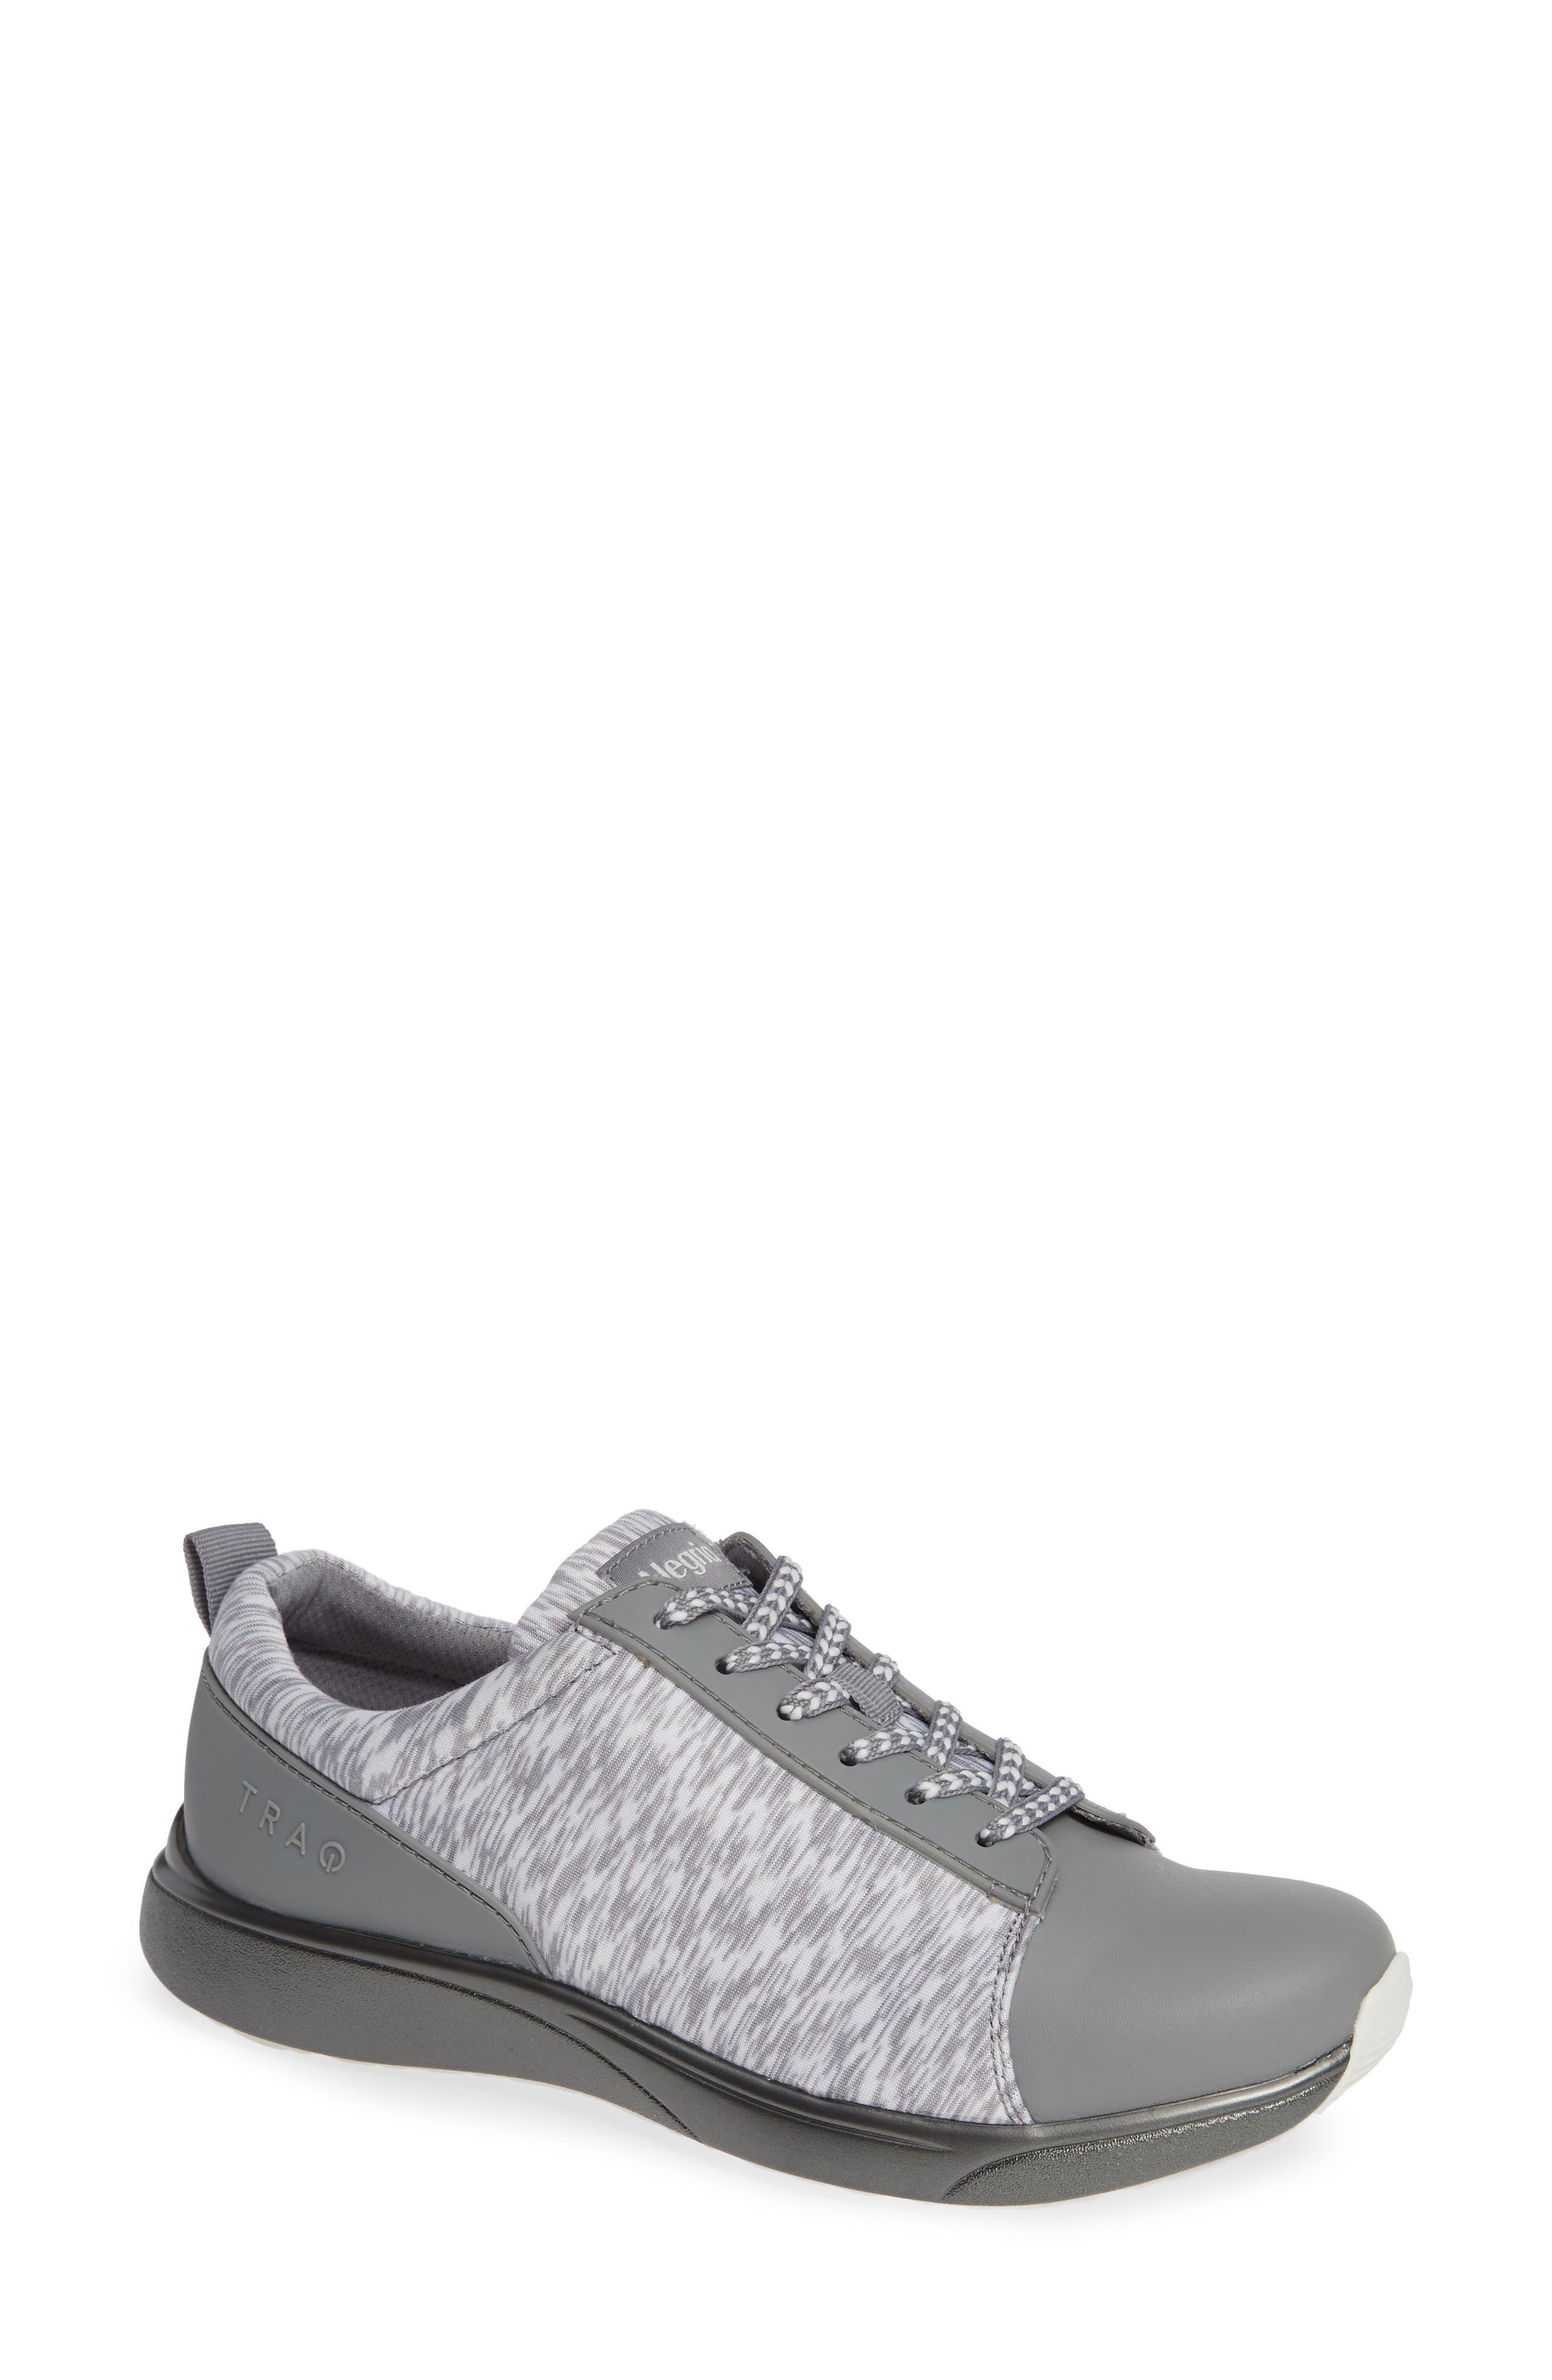 Alegria Qest Sneaker, Grey